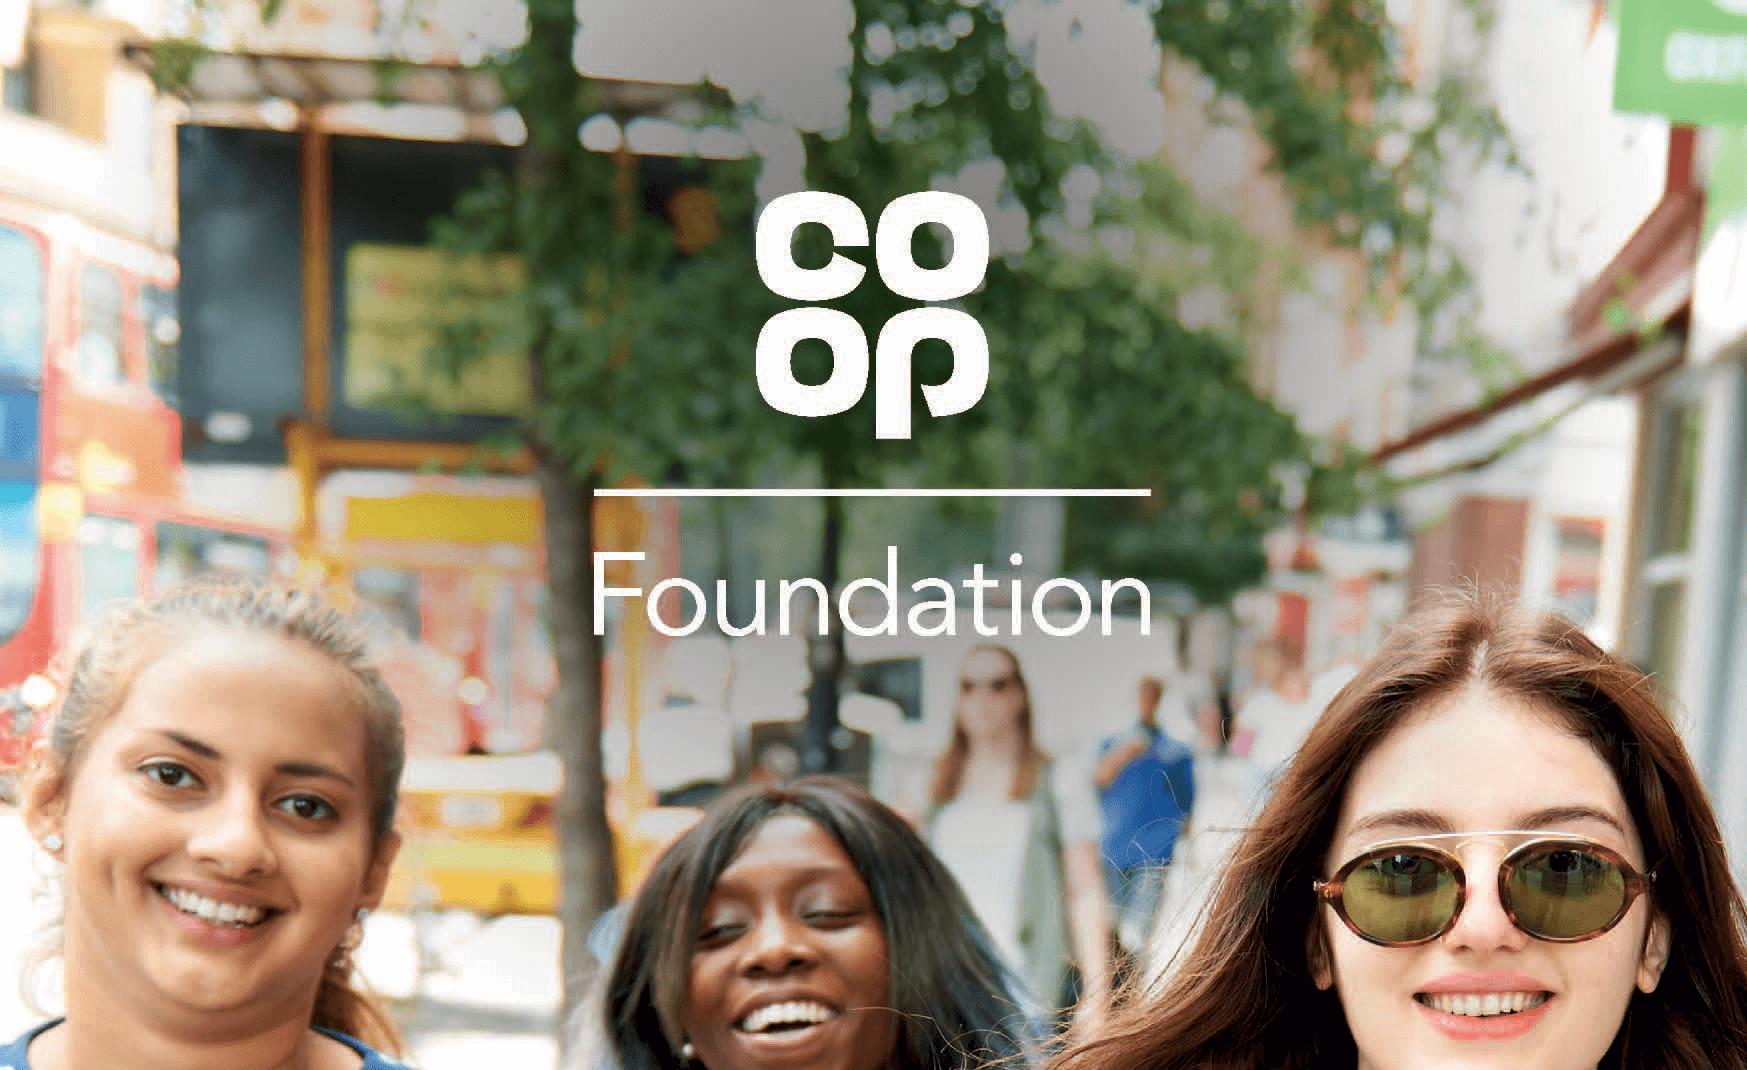 CoopFoundation